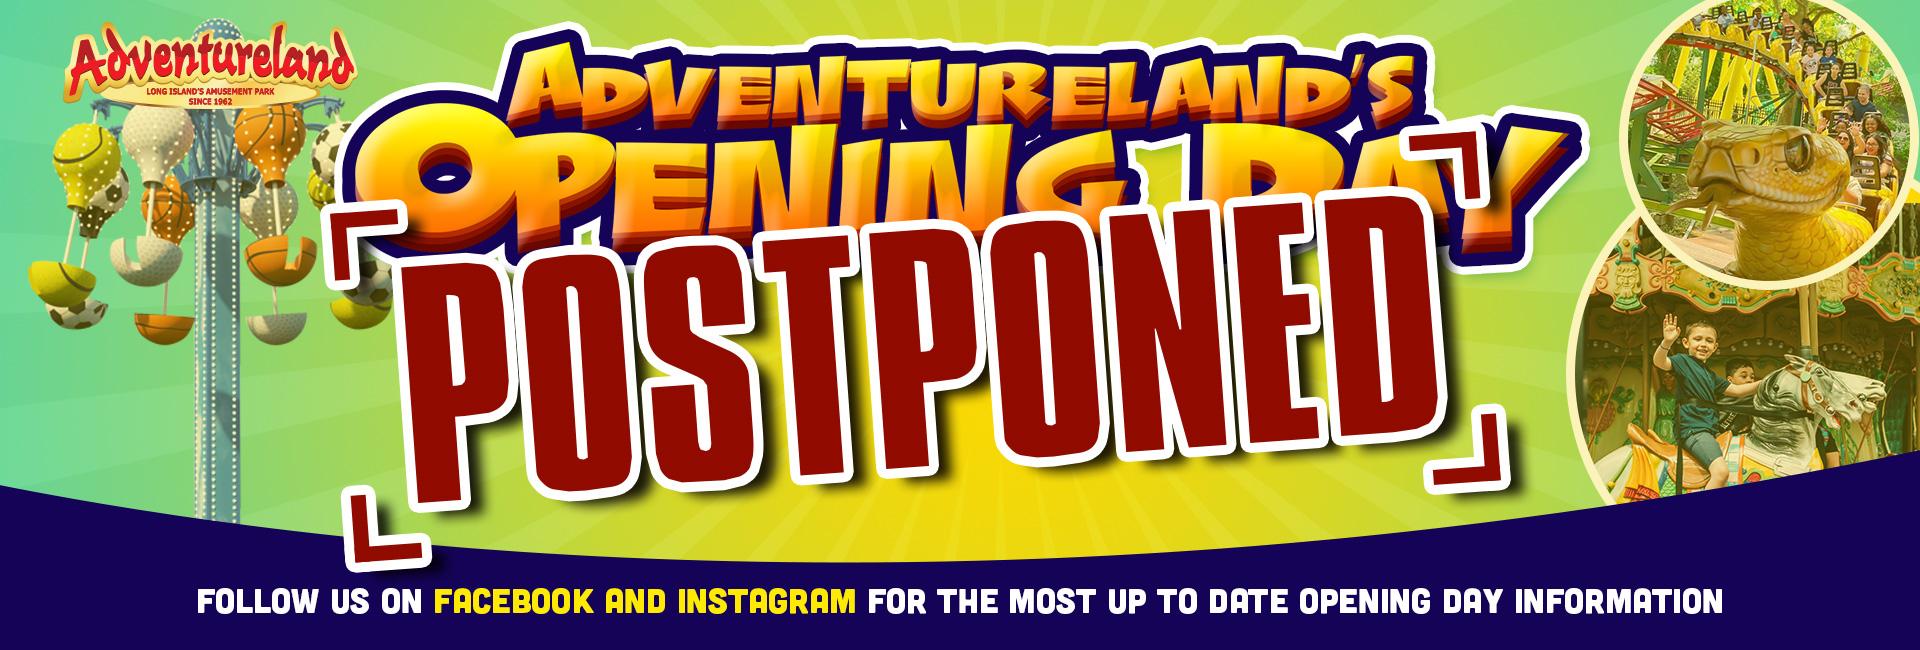 Opening Day Postponed